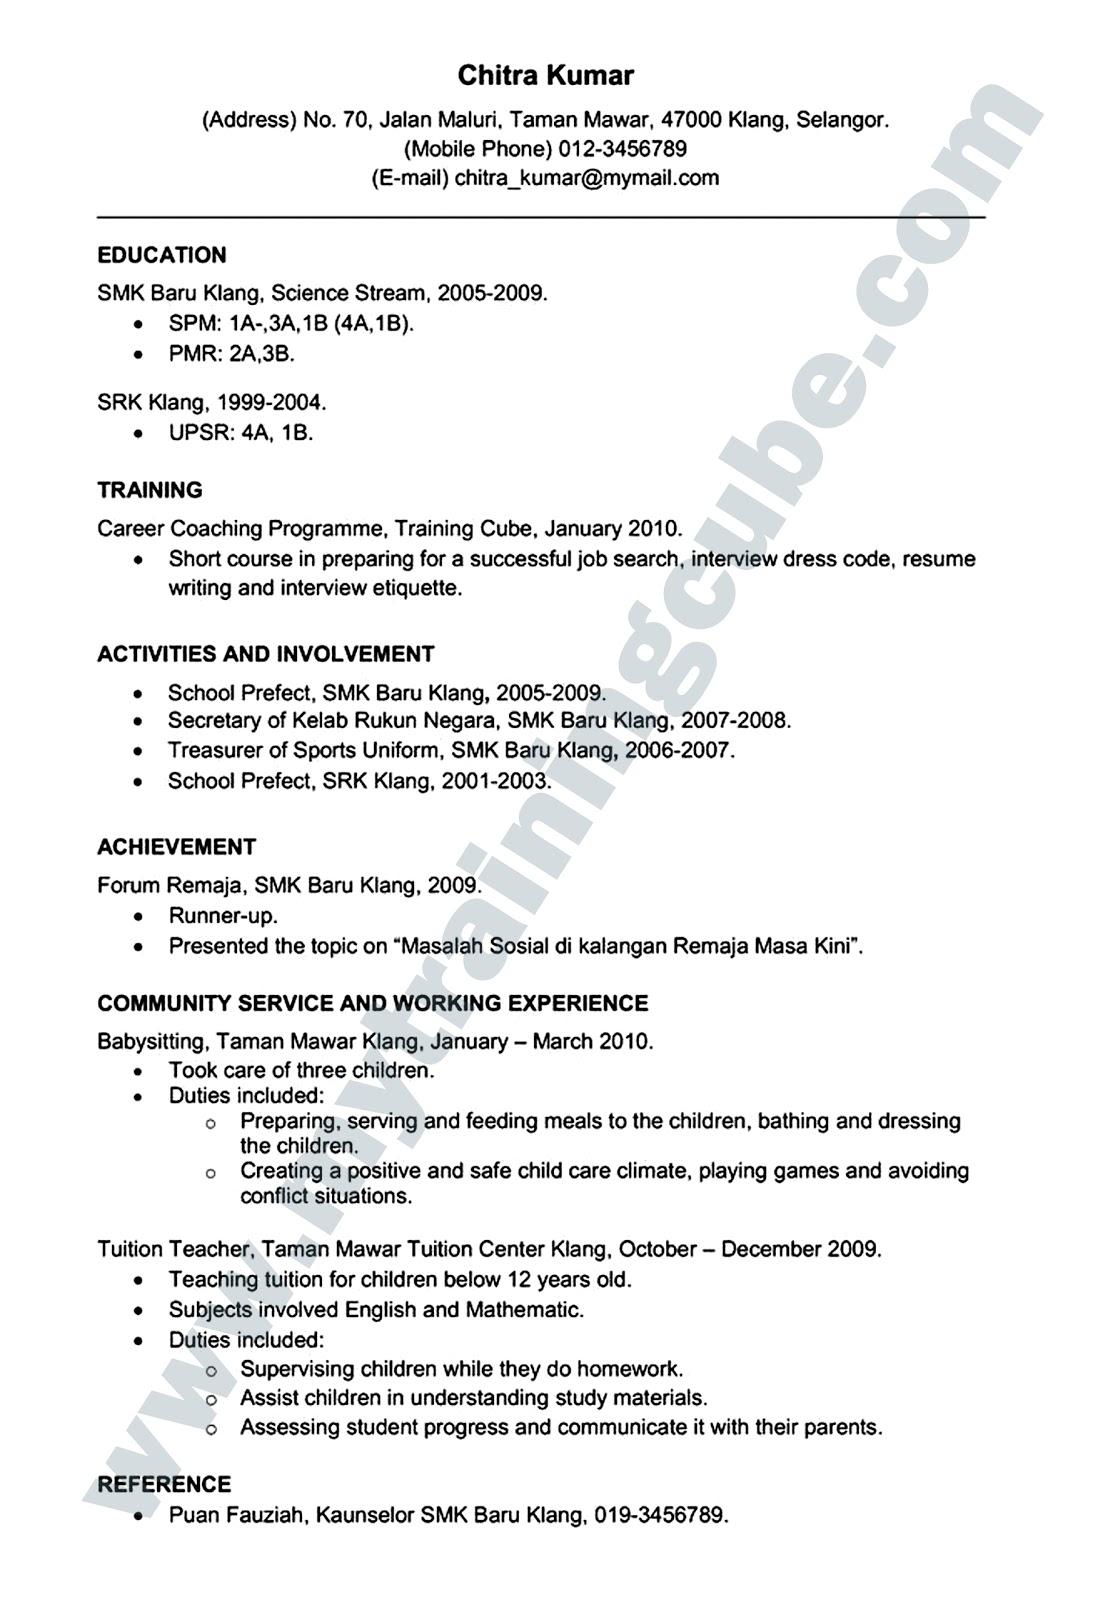 Contoh Resume Untuk Lepasan Spm - Contoh 36